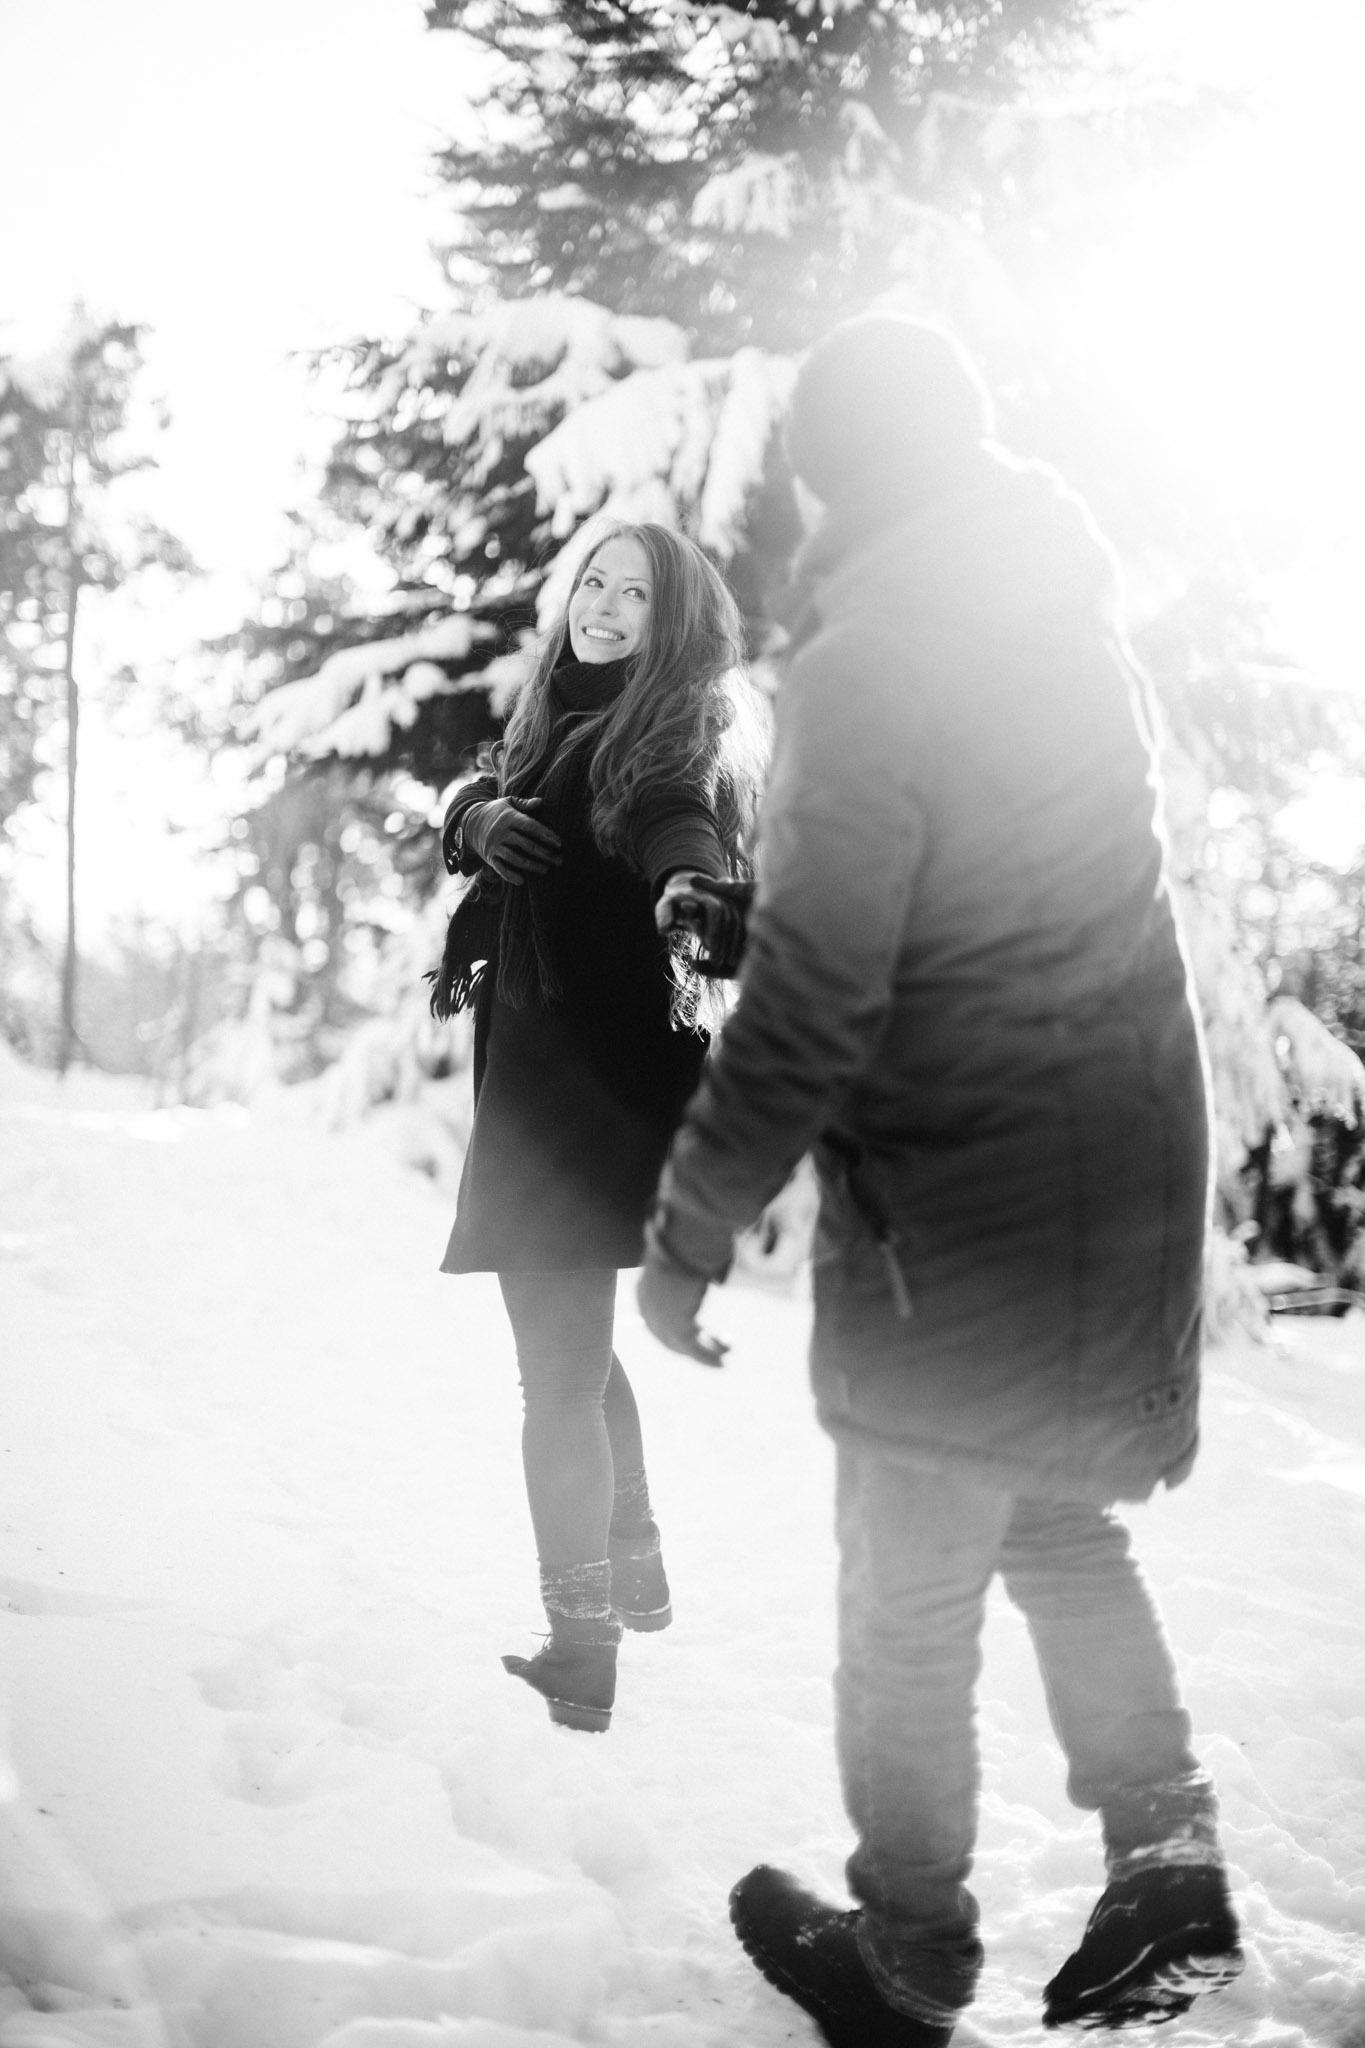 Grosser-Feldberg-Frankfurt-Engagement-Pia-Anna-Christian-Wedding-Photography-SE-65.jpg